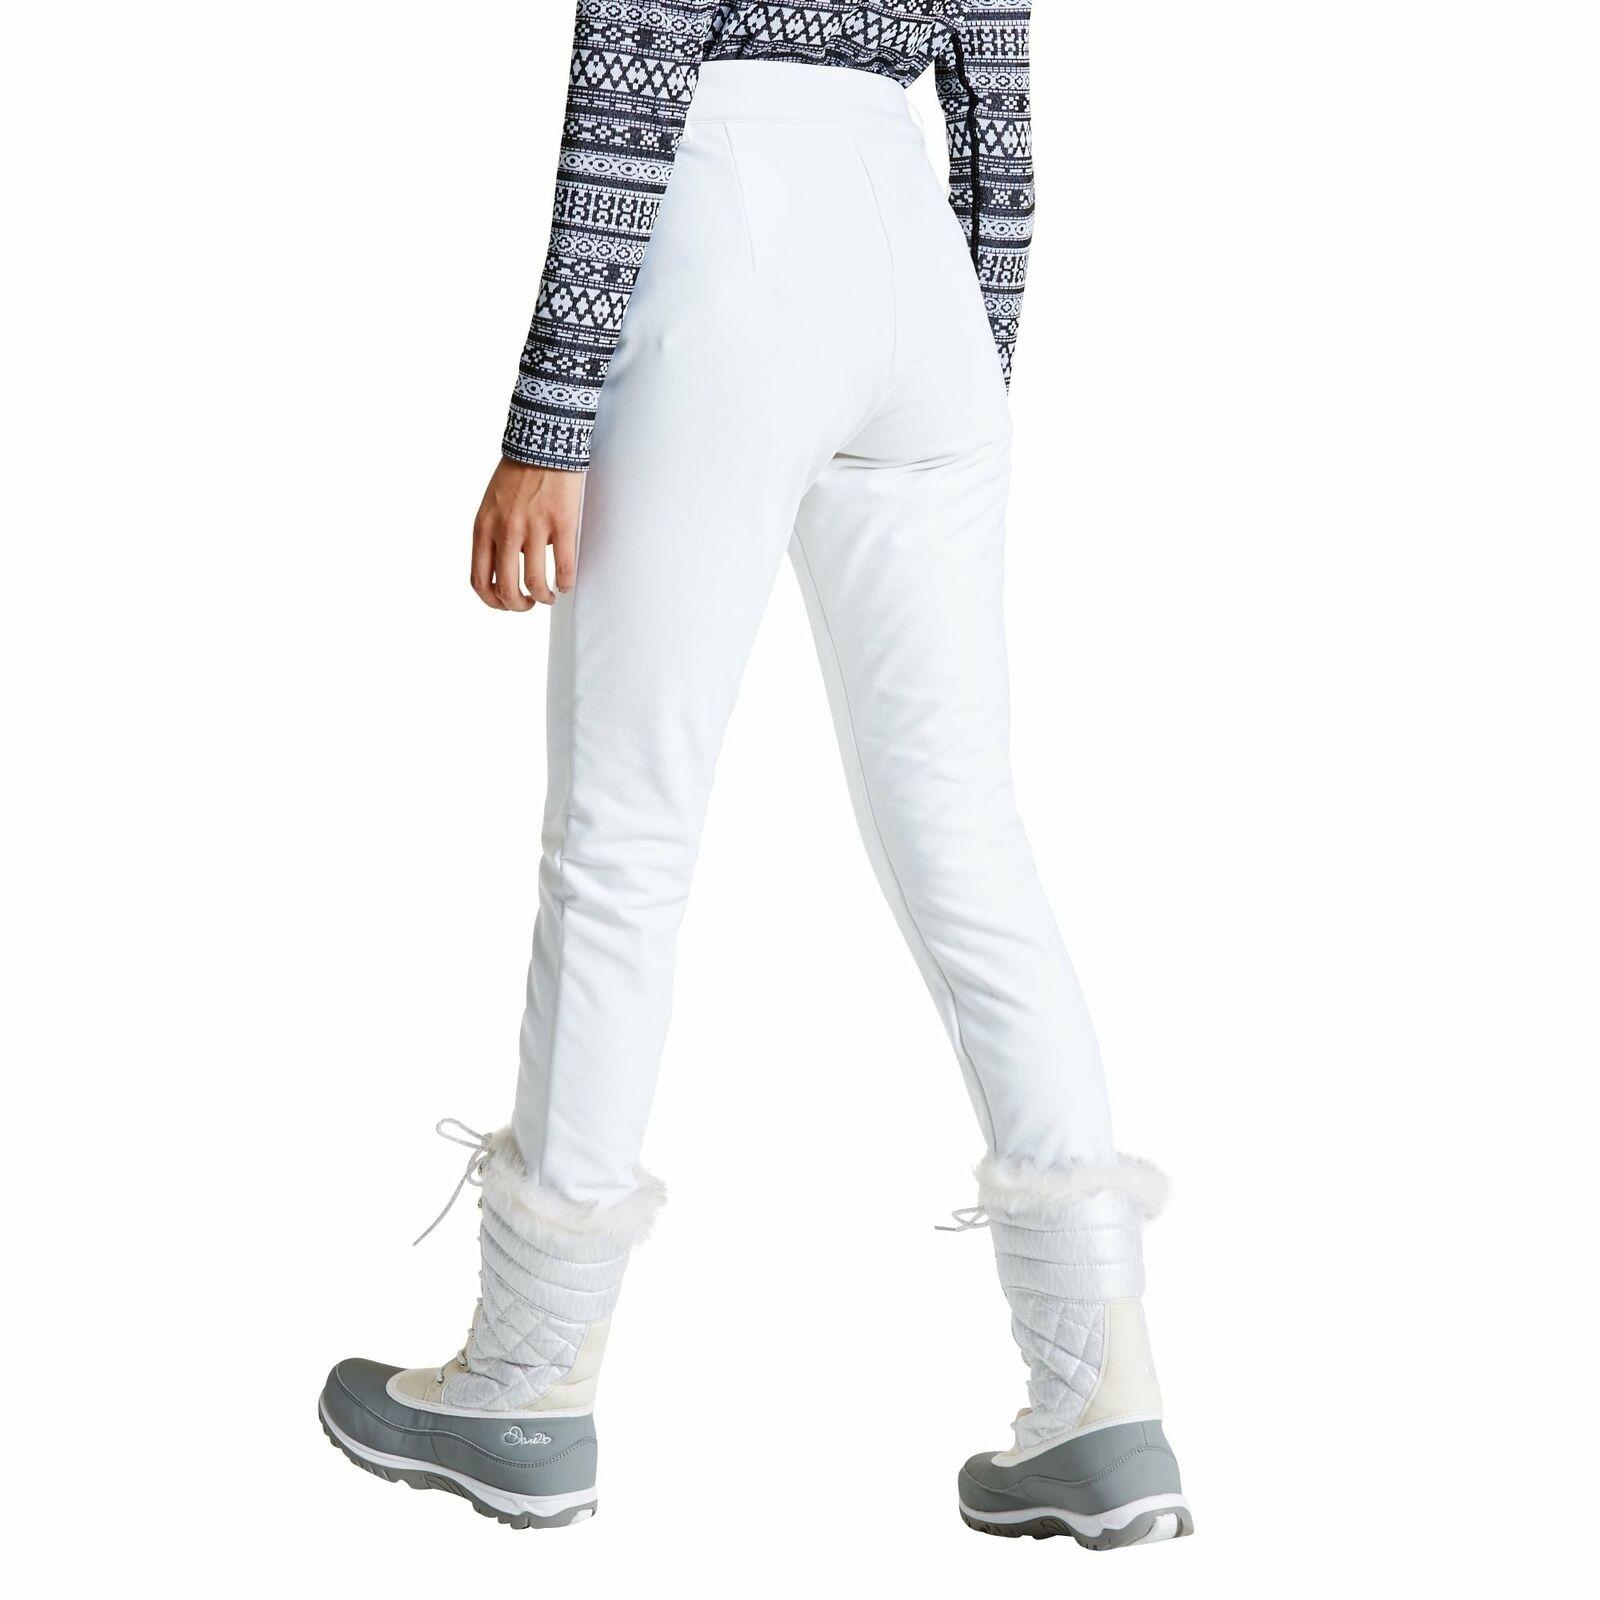 Dare2b-Shapely-Women-039-s-Windproof-Waterproof-Breathable-Ski-Trouser thumbnail 6